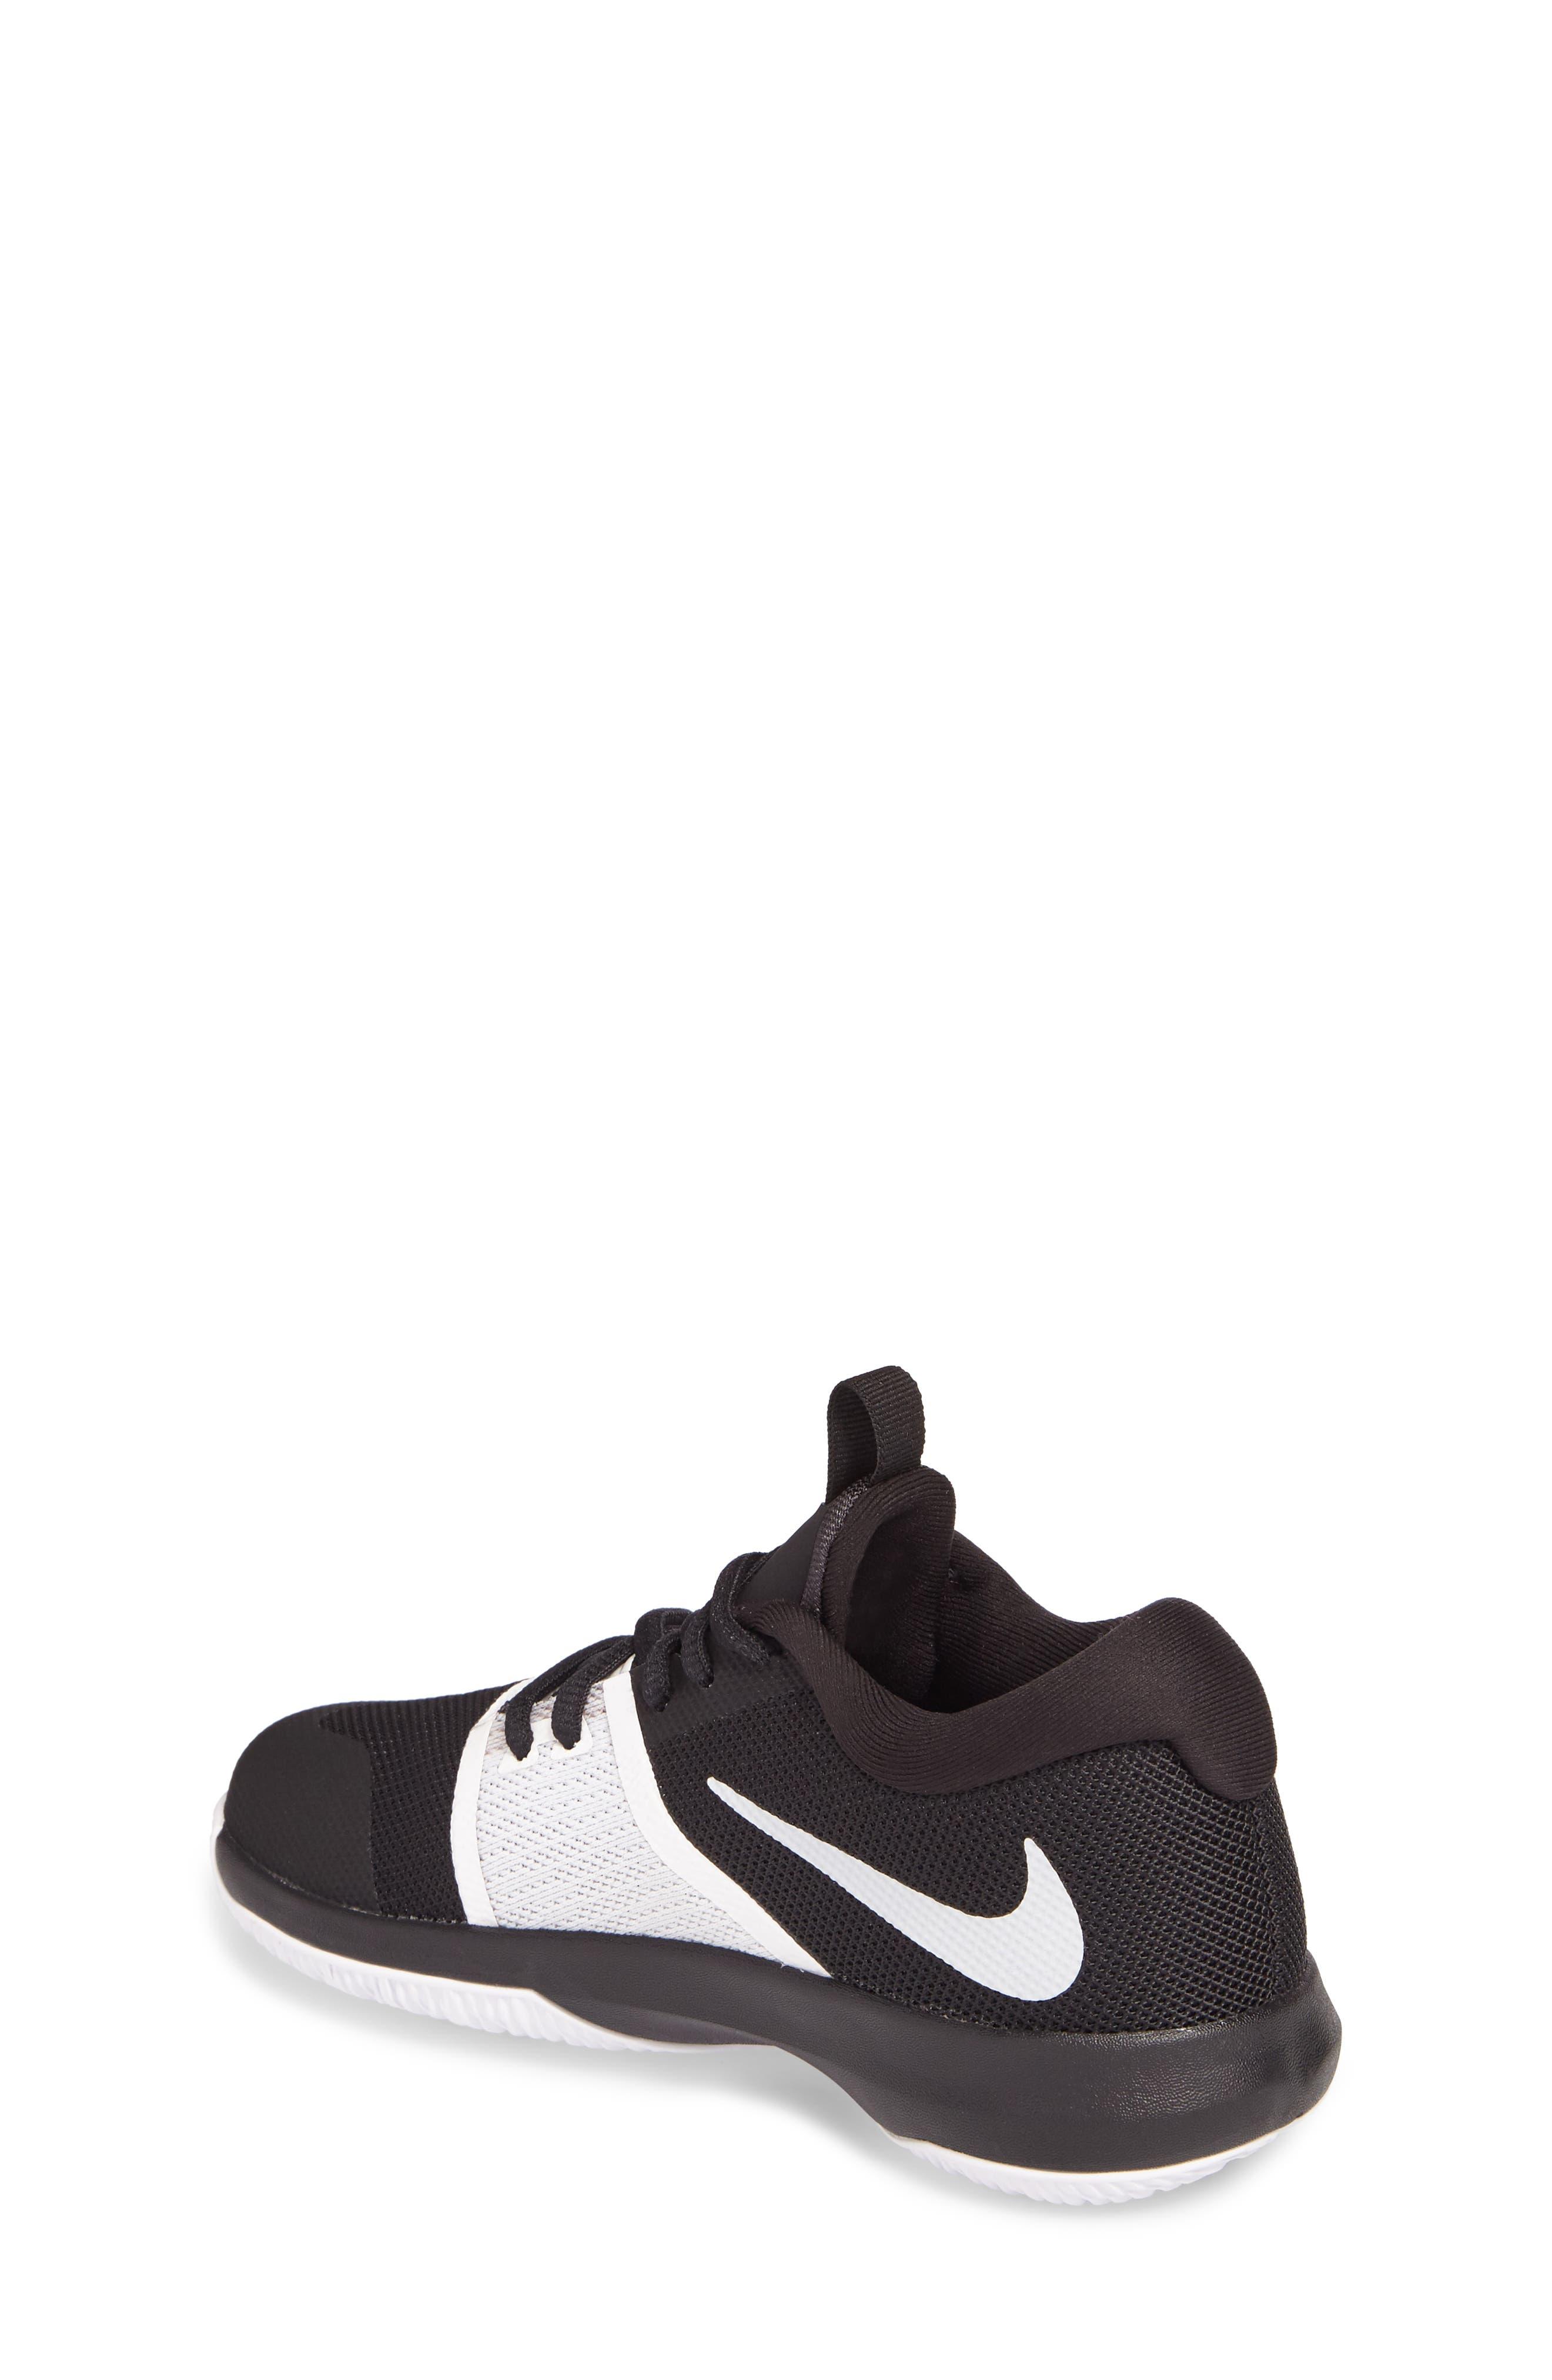 Assersion Sneaker,                             Alternate thumbnail 2, color,                             005